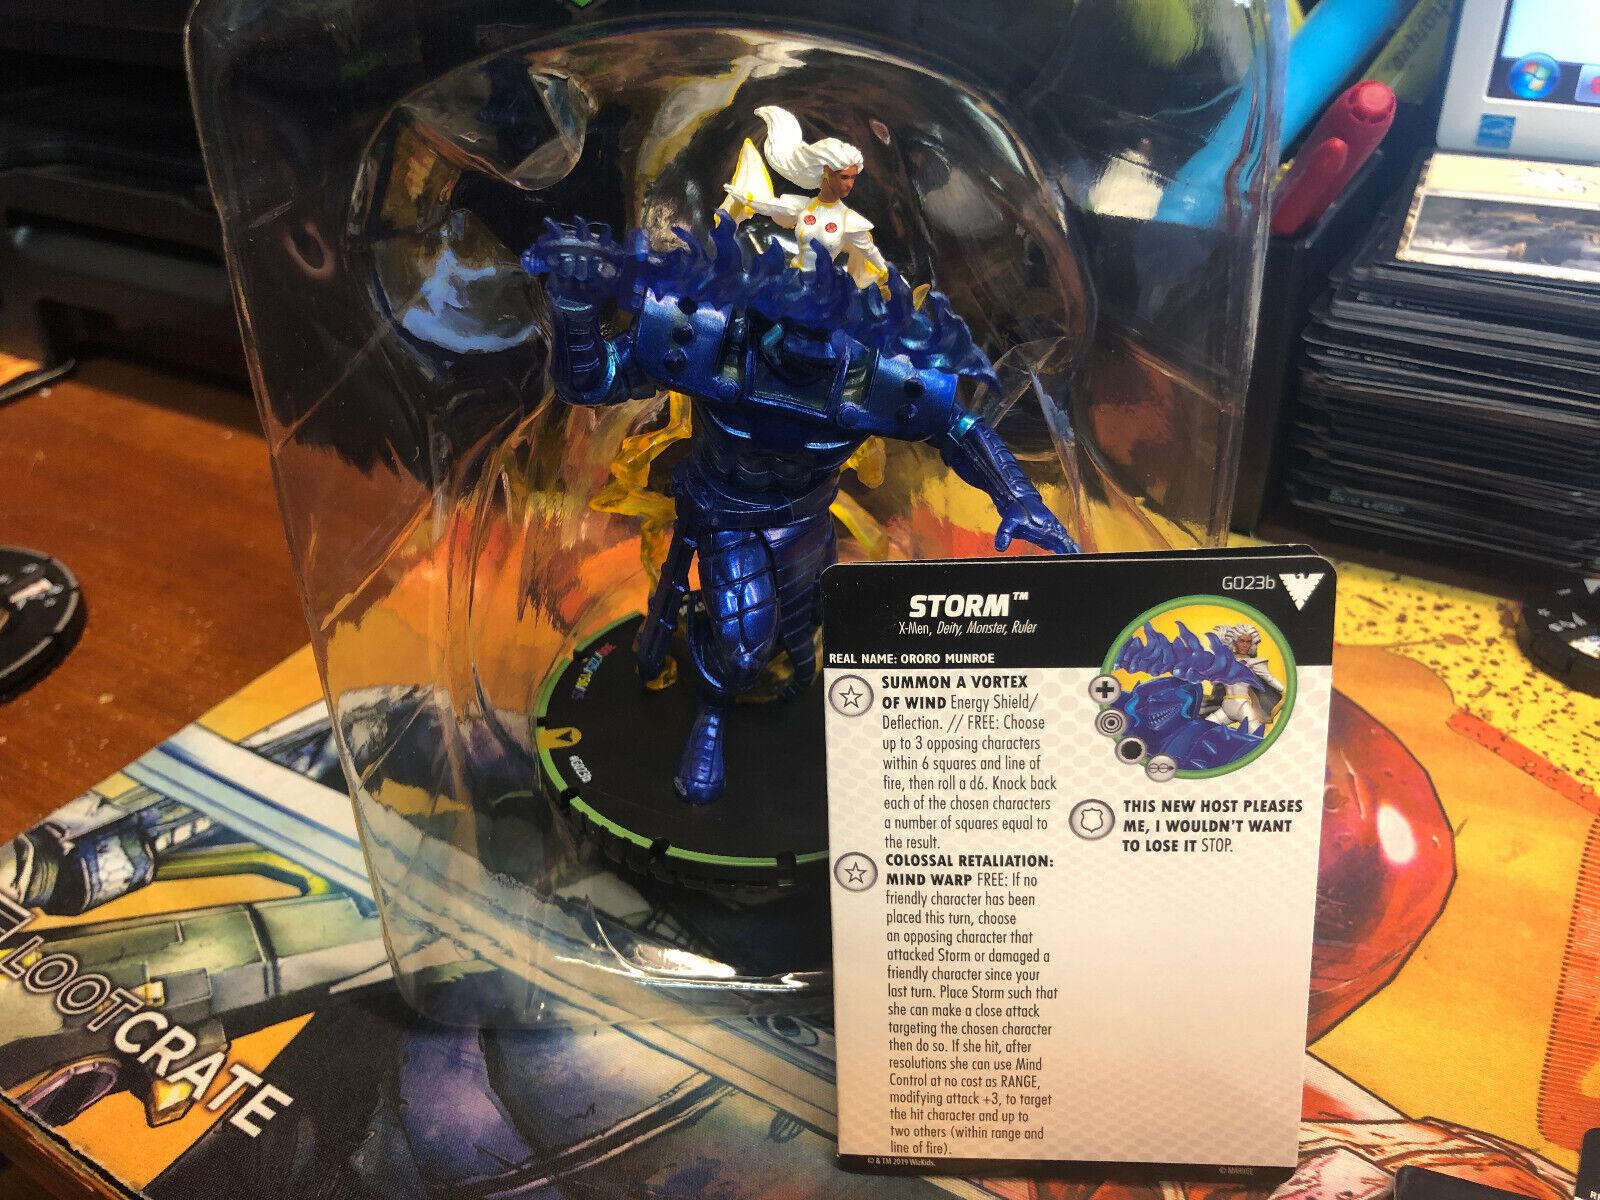 Heroclix X-men aniamted Serie Dark Phoenix Storm g023b Prime